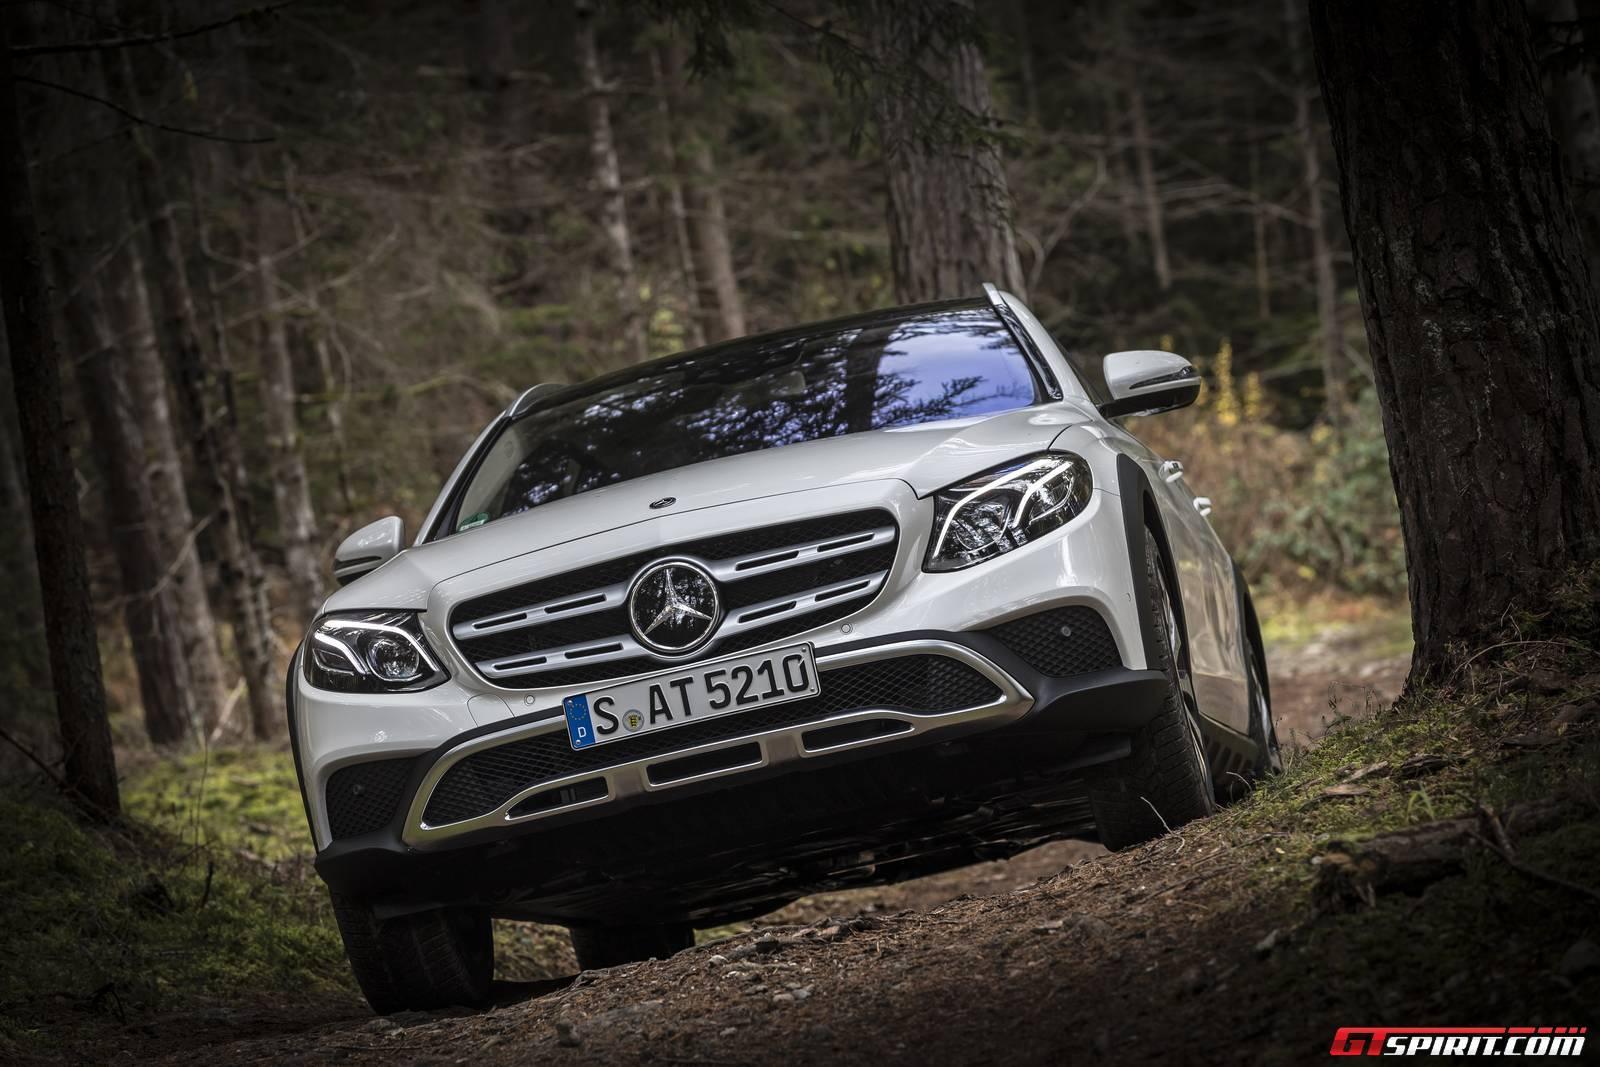 https://storage.googleapis.com/gtspirit/uploads/2016/12/Designo-Diamond-White-Mercedes-Benz-E220d-4Matic-All-Terrain-1.jpg